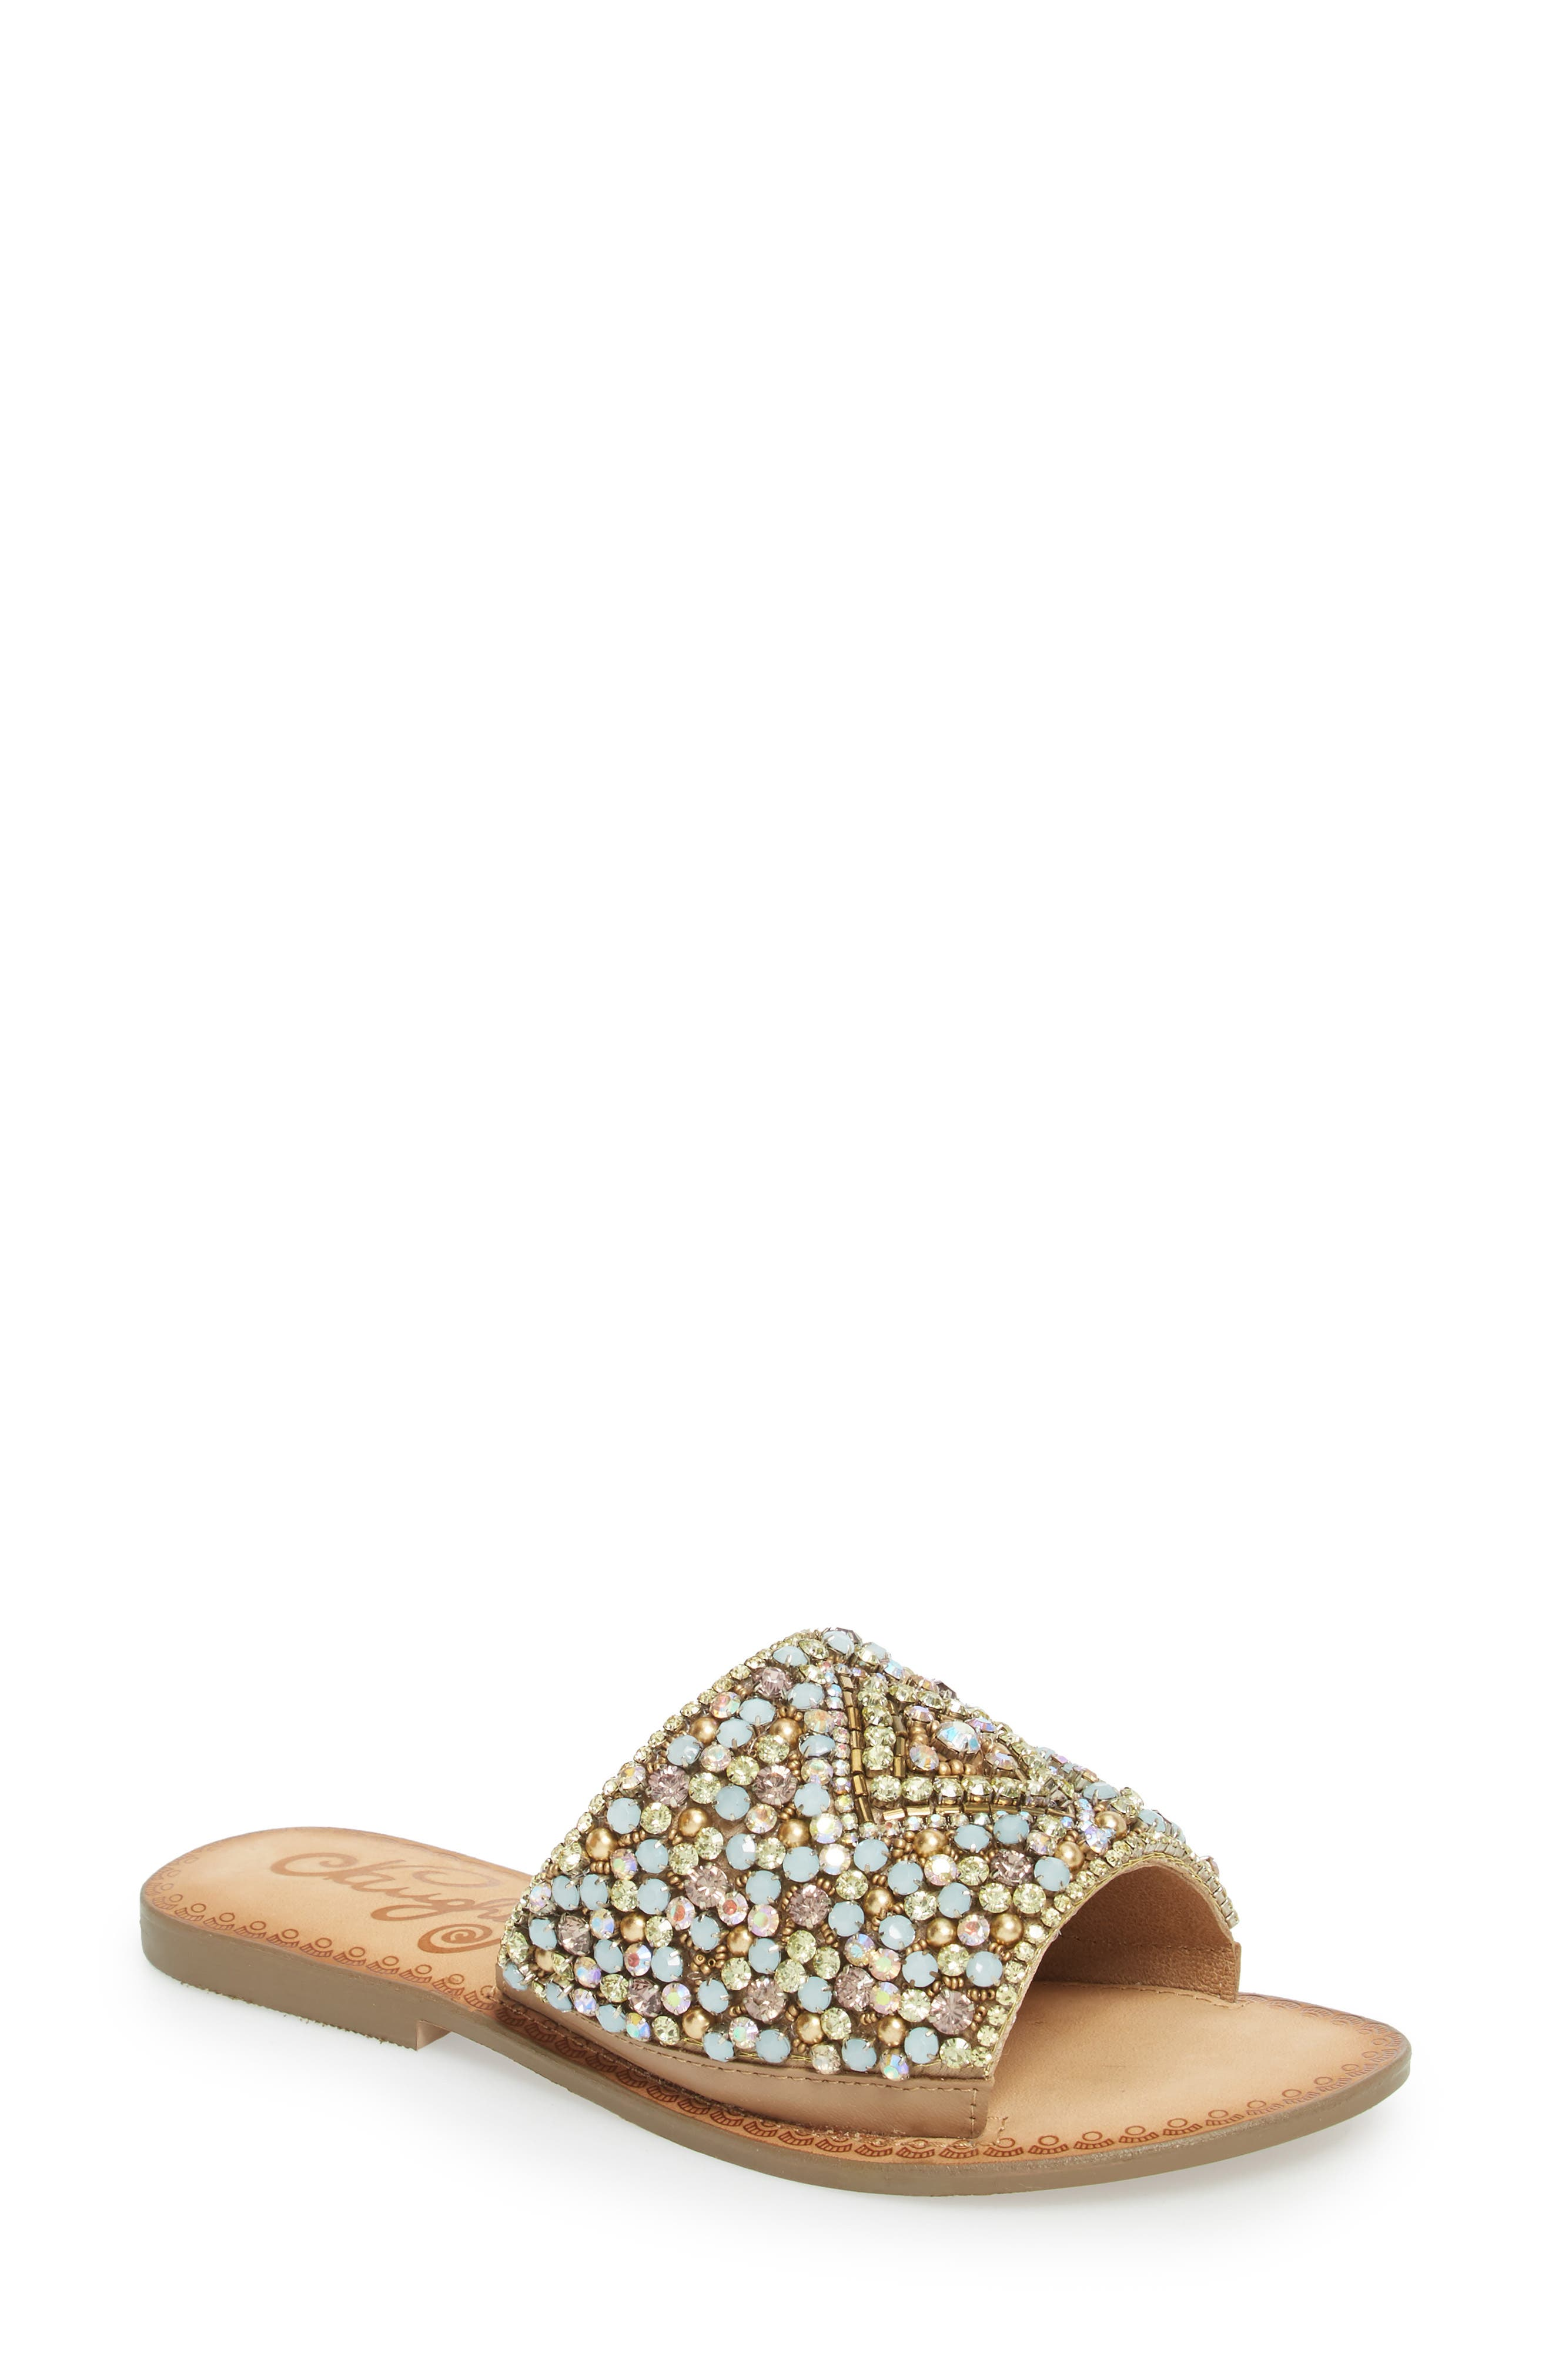 Susanna Embellished Slide Sandal,                             Main thumbnail 1, color,                             Multi Leather